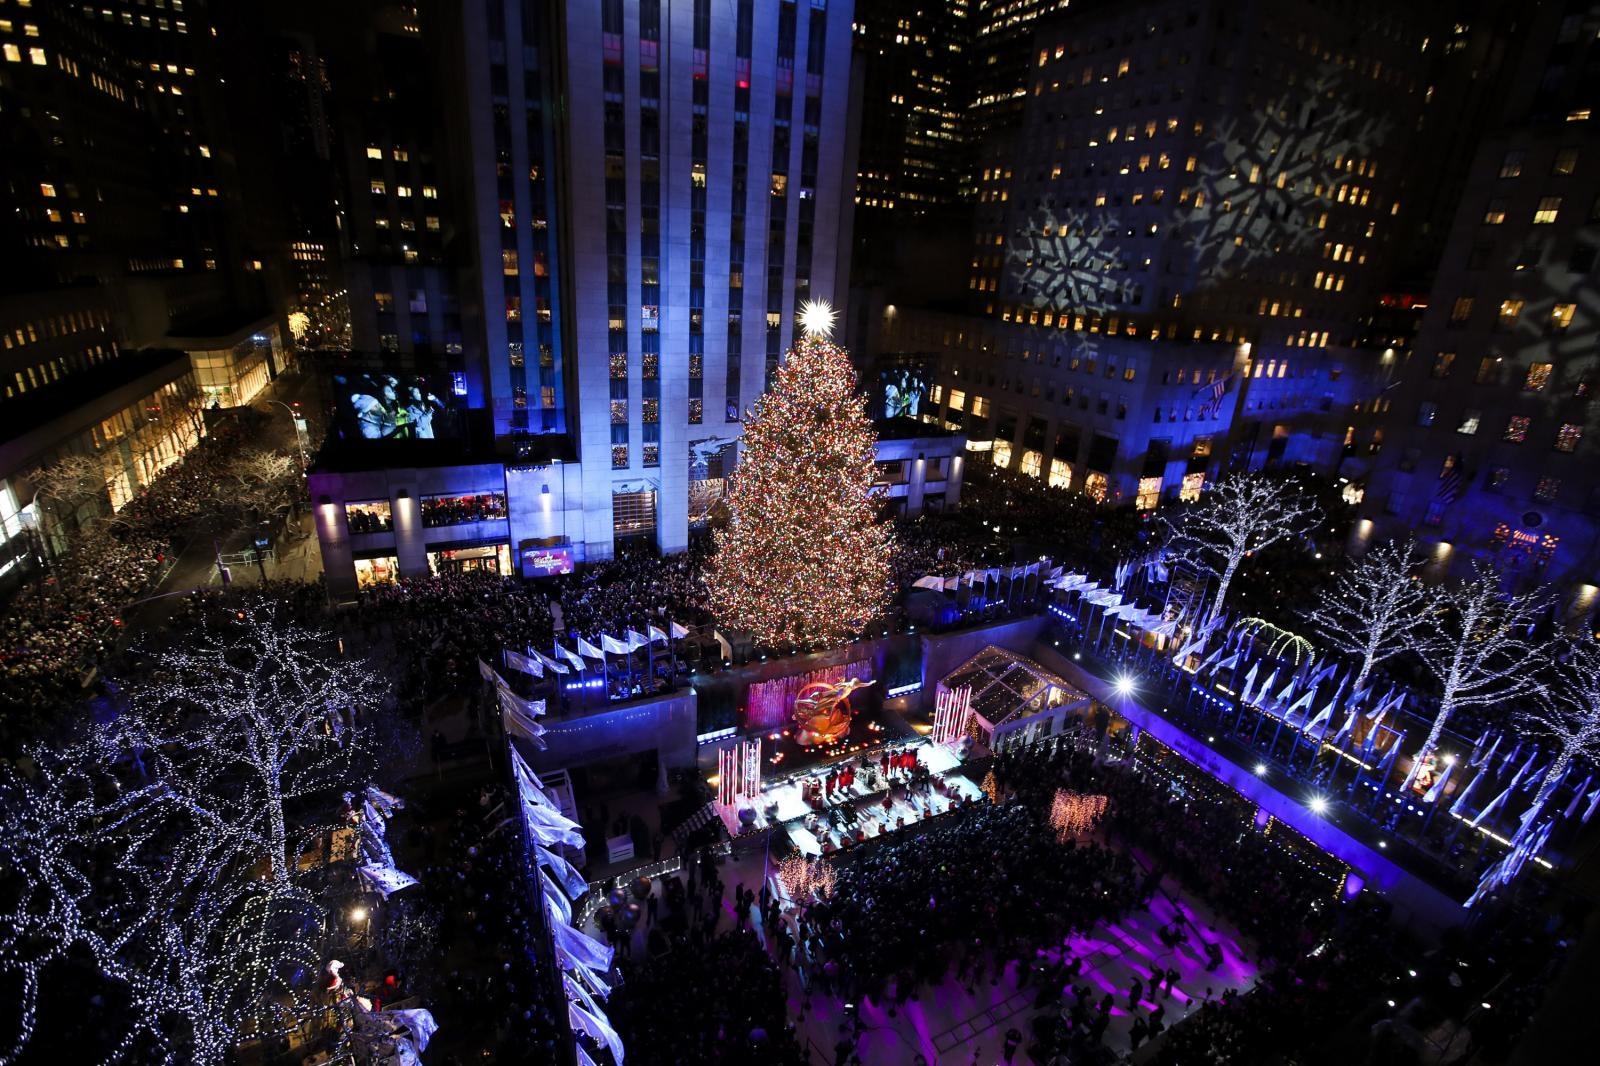 Božično drevo, New York Vir:Pixsell